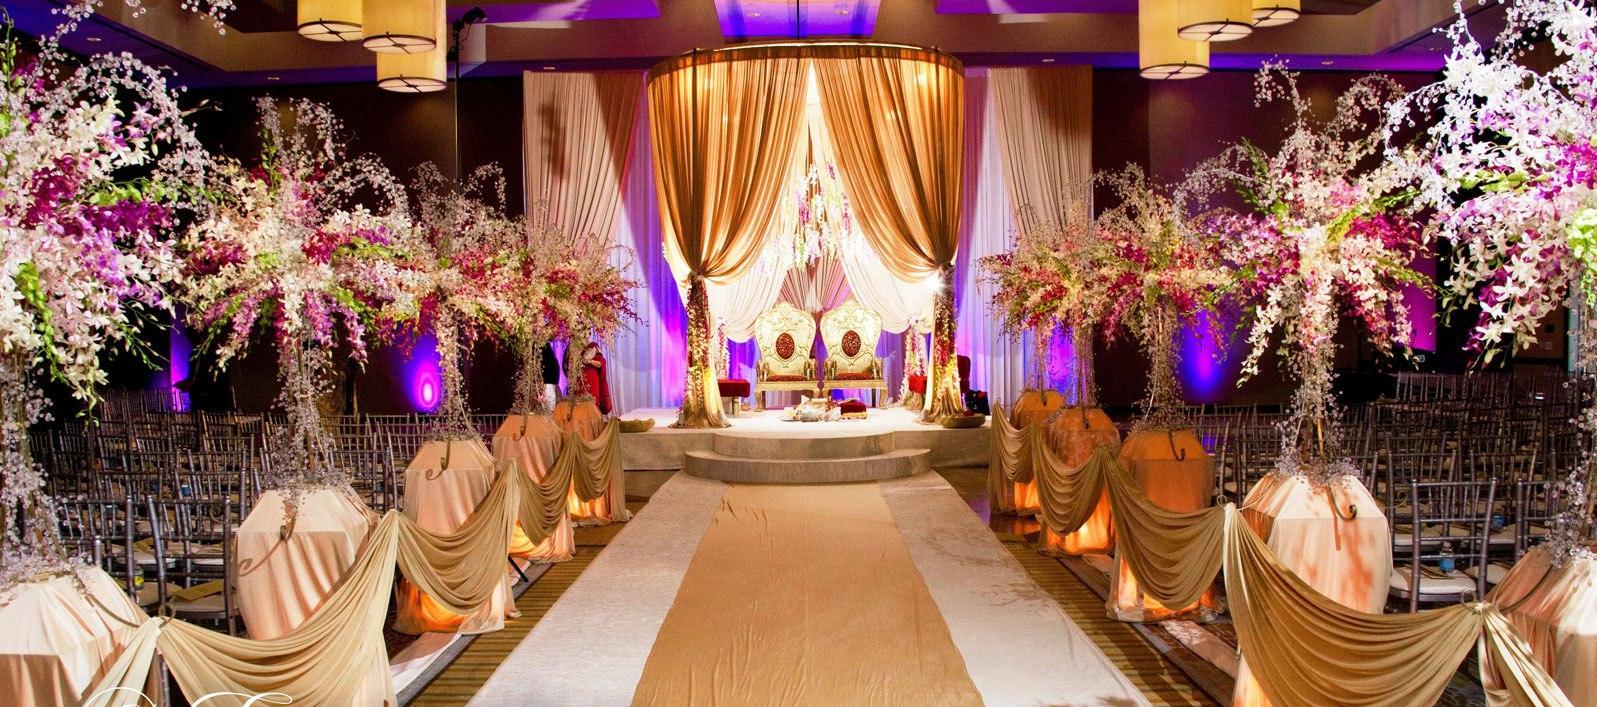 D:\Jaspal\Amoretti\Guest Post\indian-wedding-ceremony-3.jpg